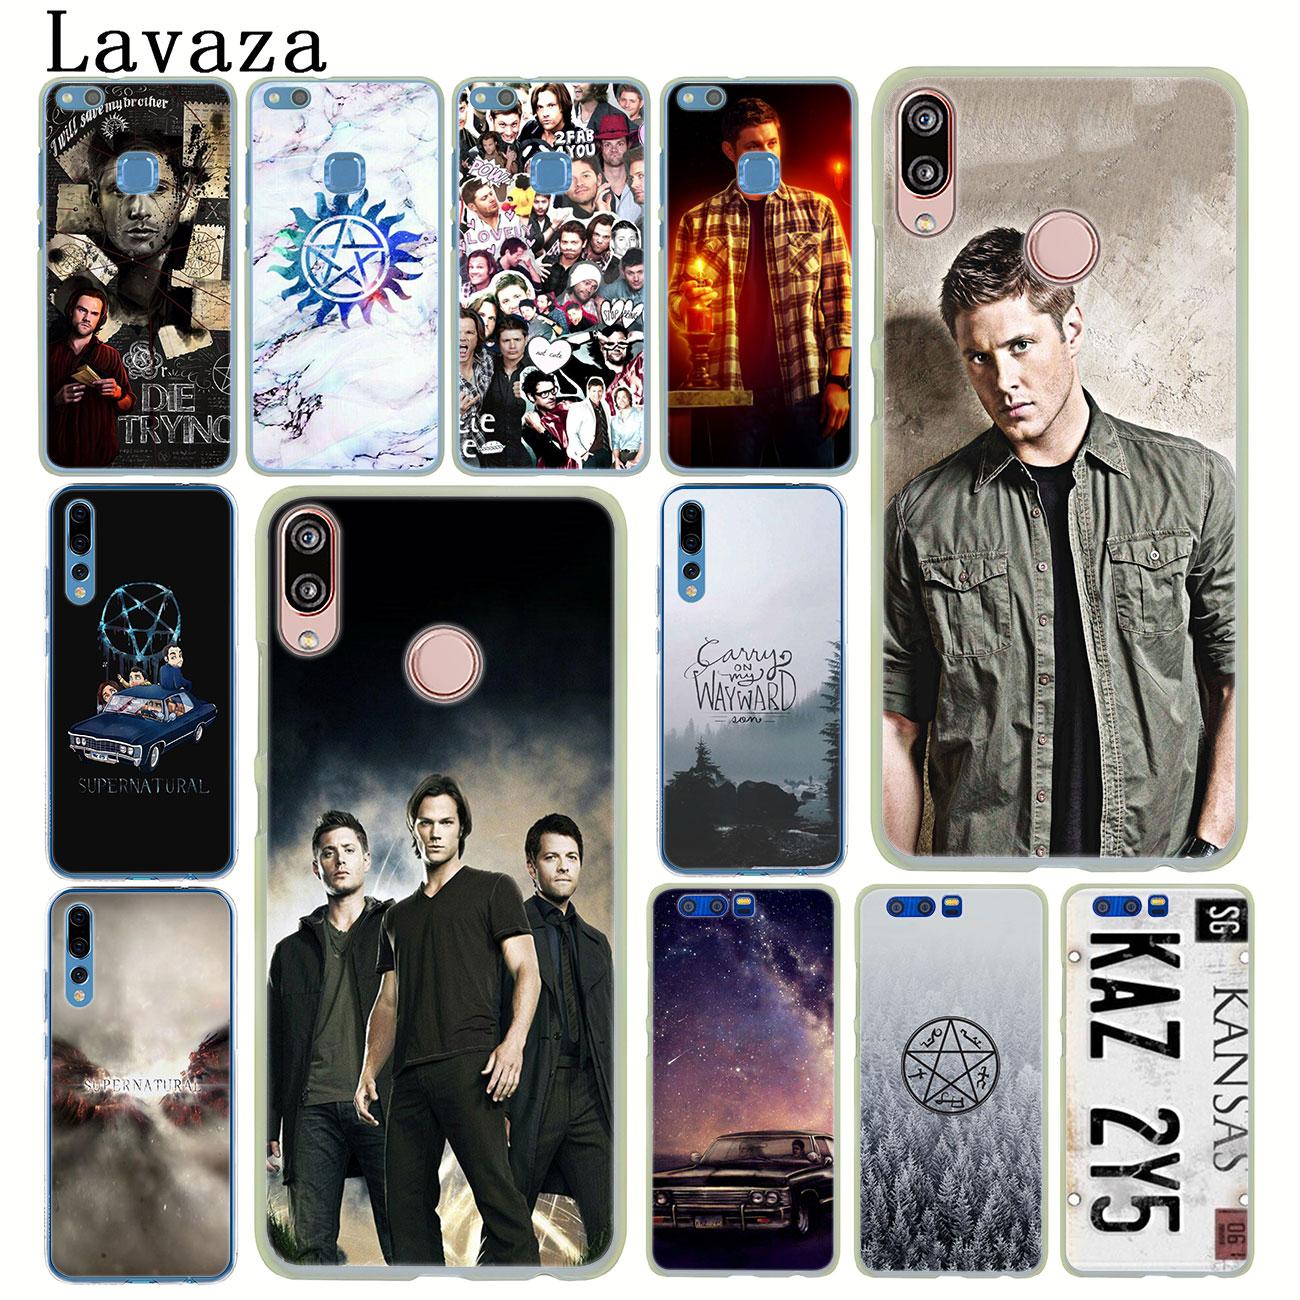 Lavaza sobrenatural Jared Padalecki funda del teléfono para Huawei P30 P20 P10 P9 más P8 Lite 2017 Mini 2016 P inteligente Z 2019